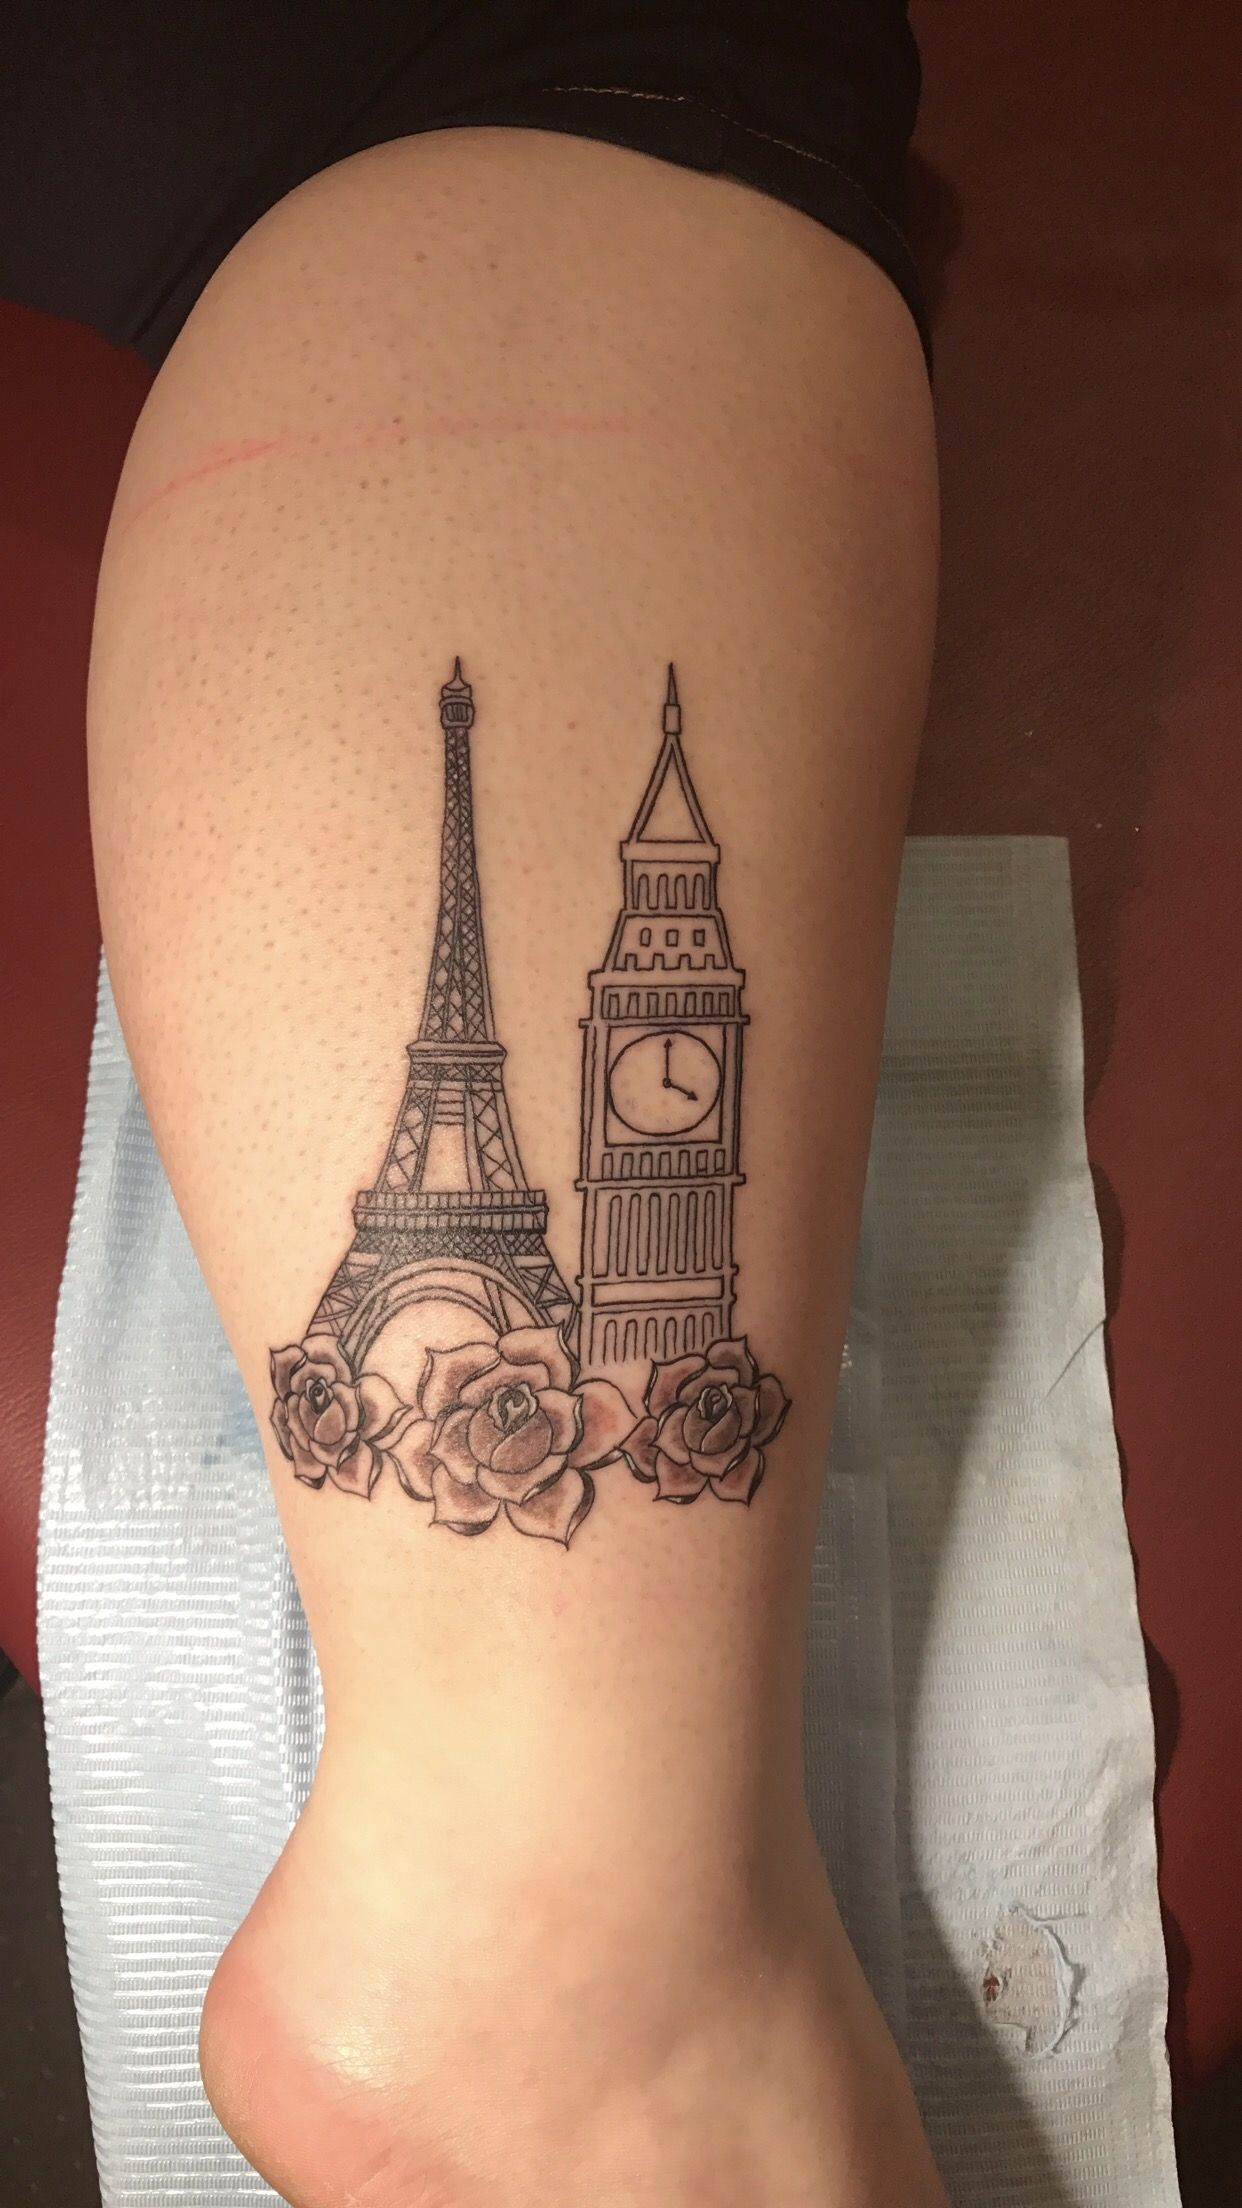 Tattoos in Europe - Tattoo Desire